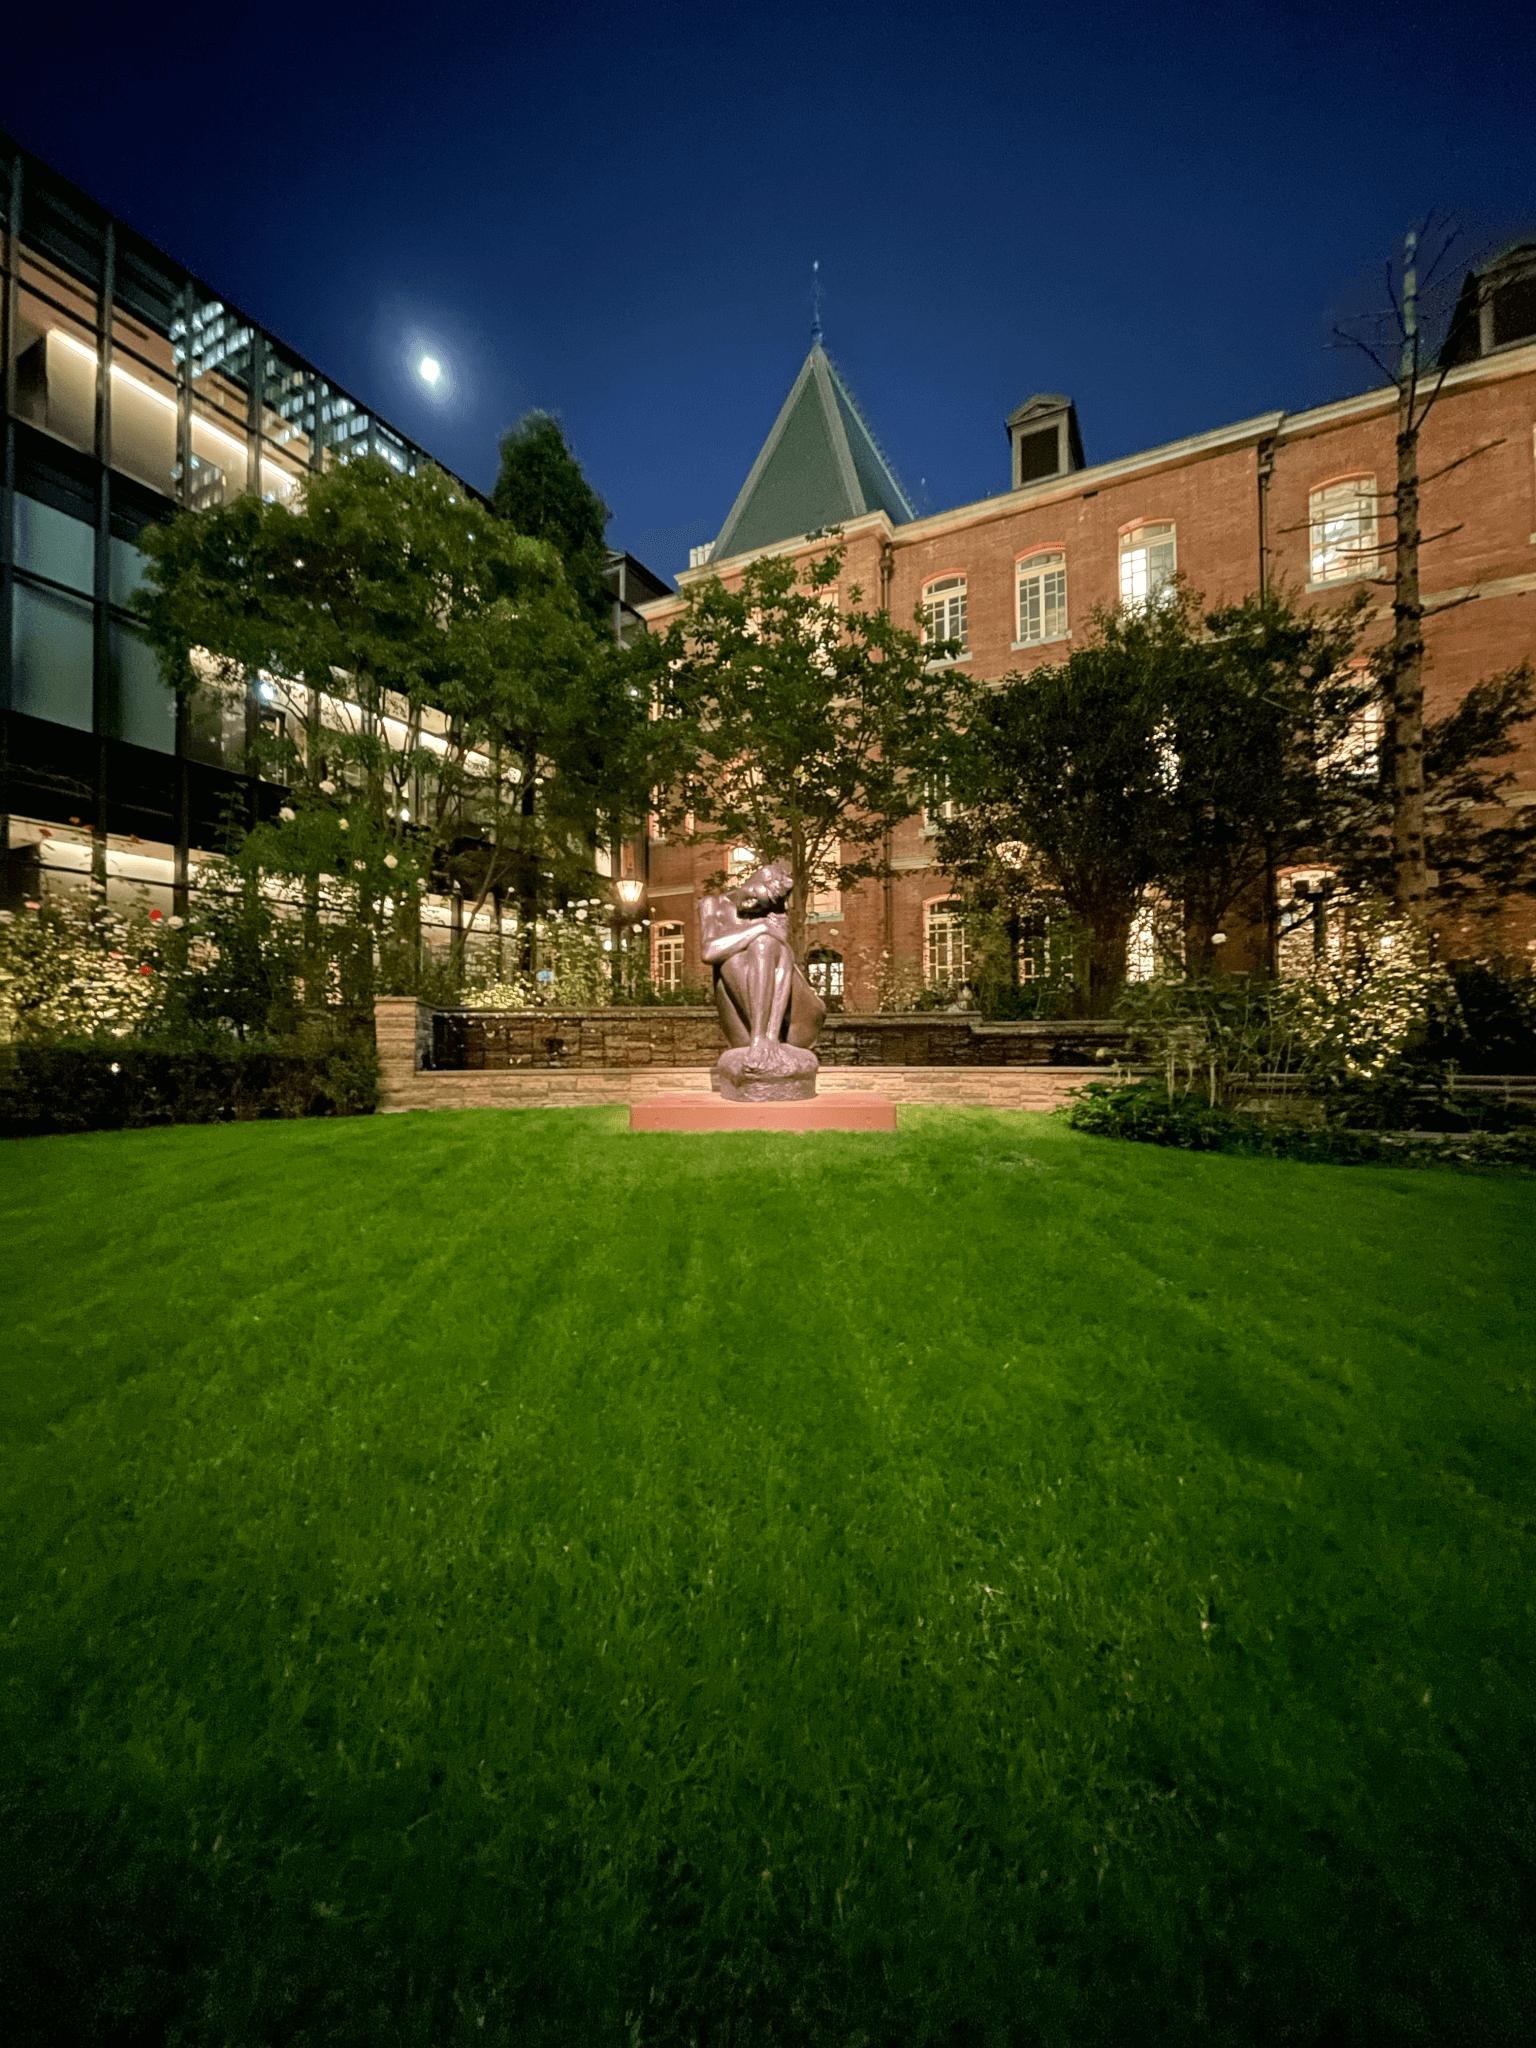 iPhone 12 Proの夜間の超広角撮影